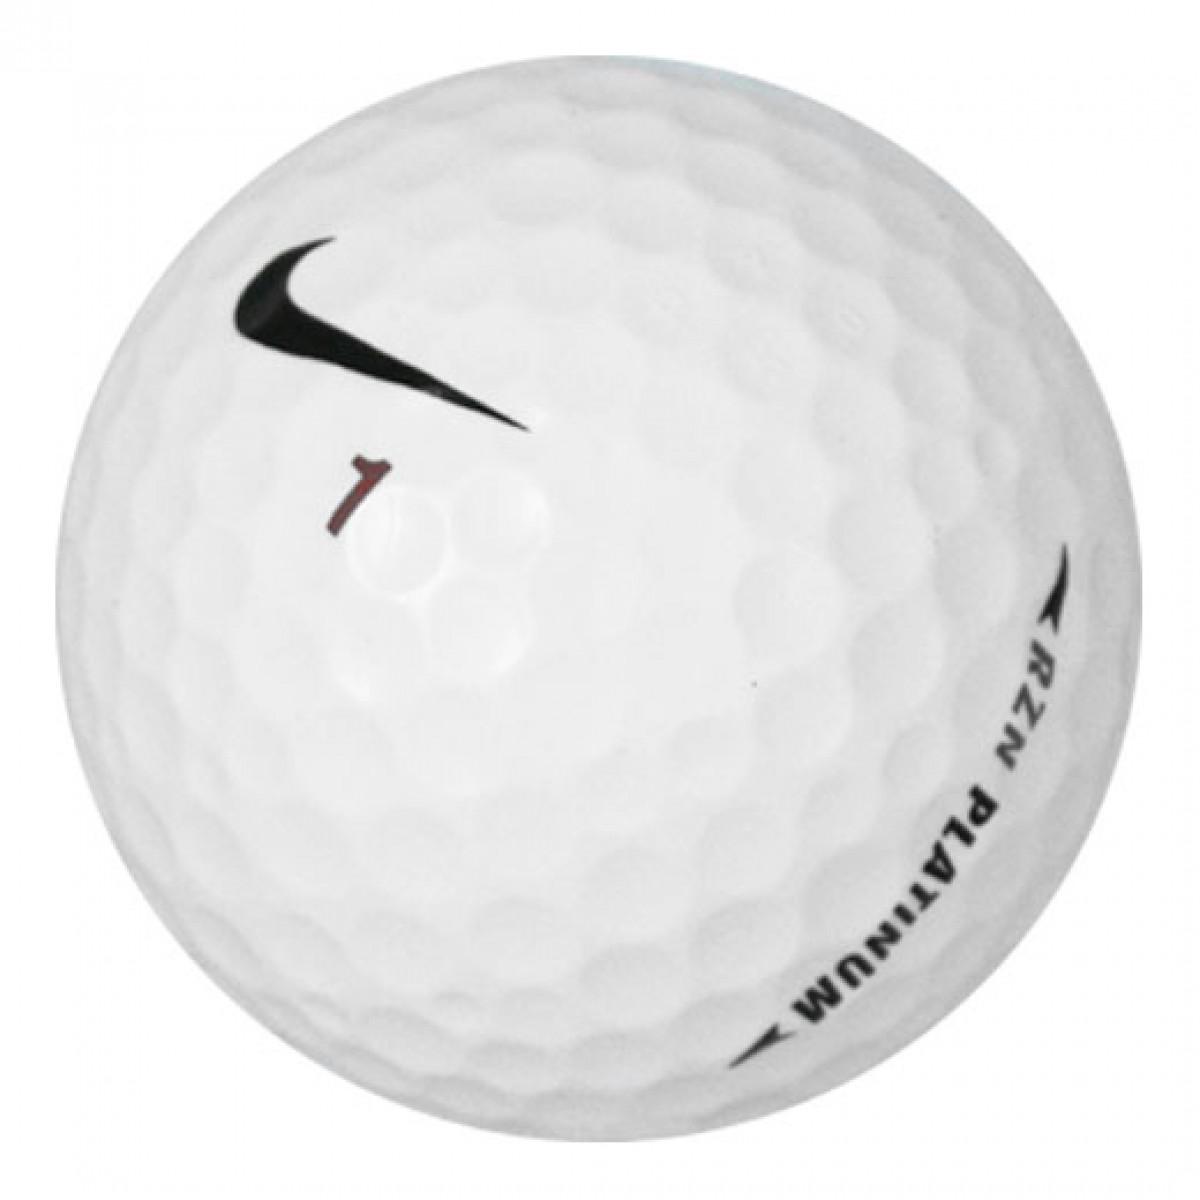 Nike RZN Platinum used golf balls d8433a364